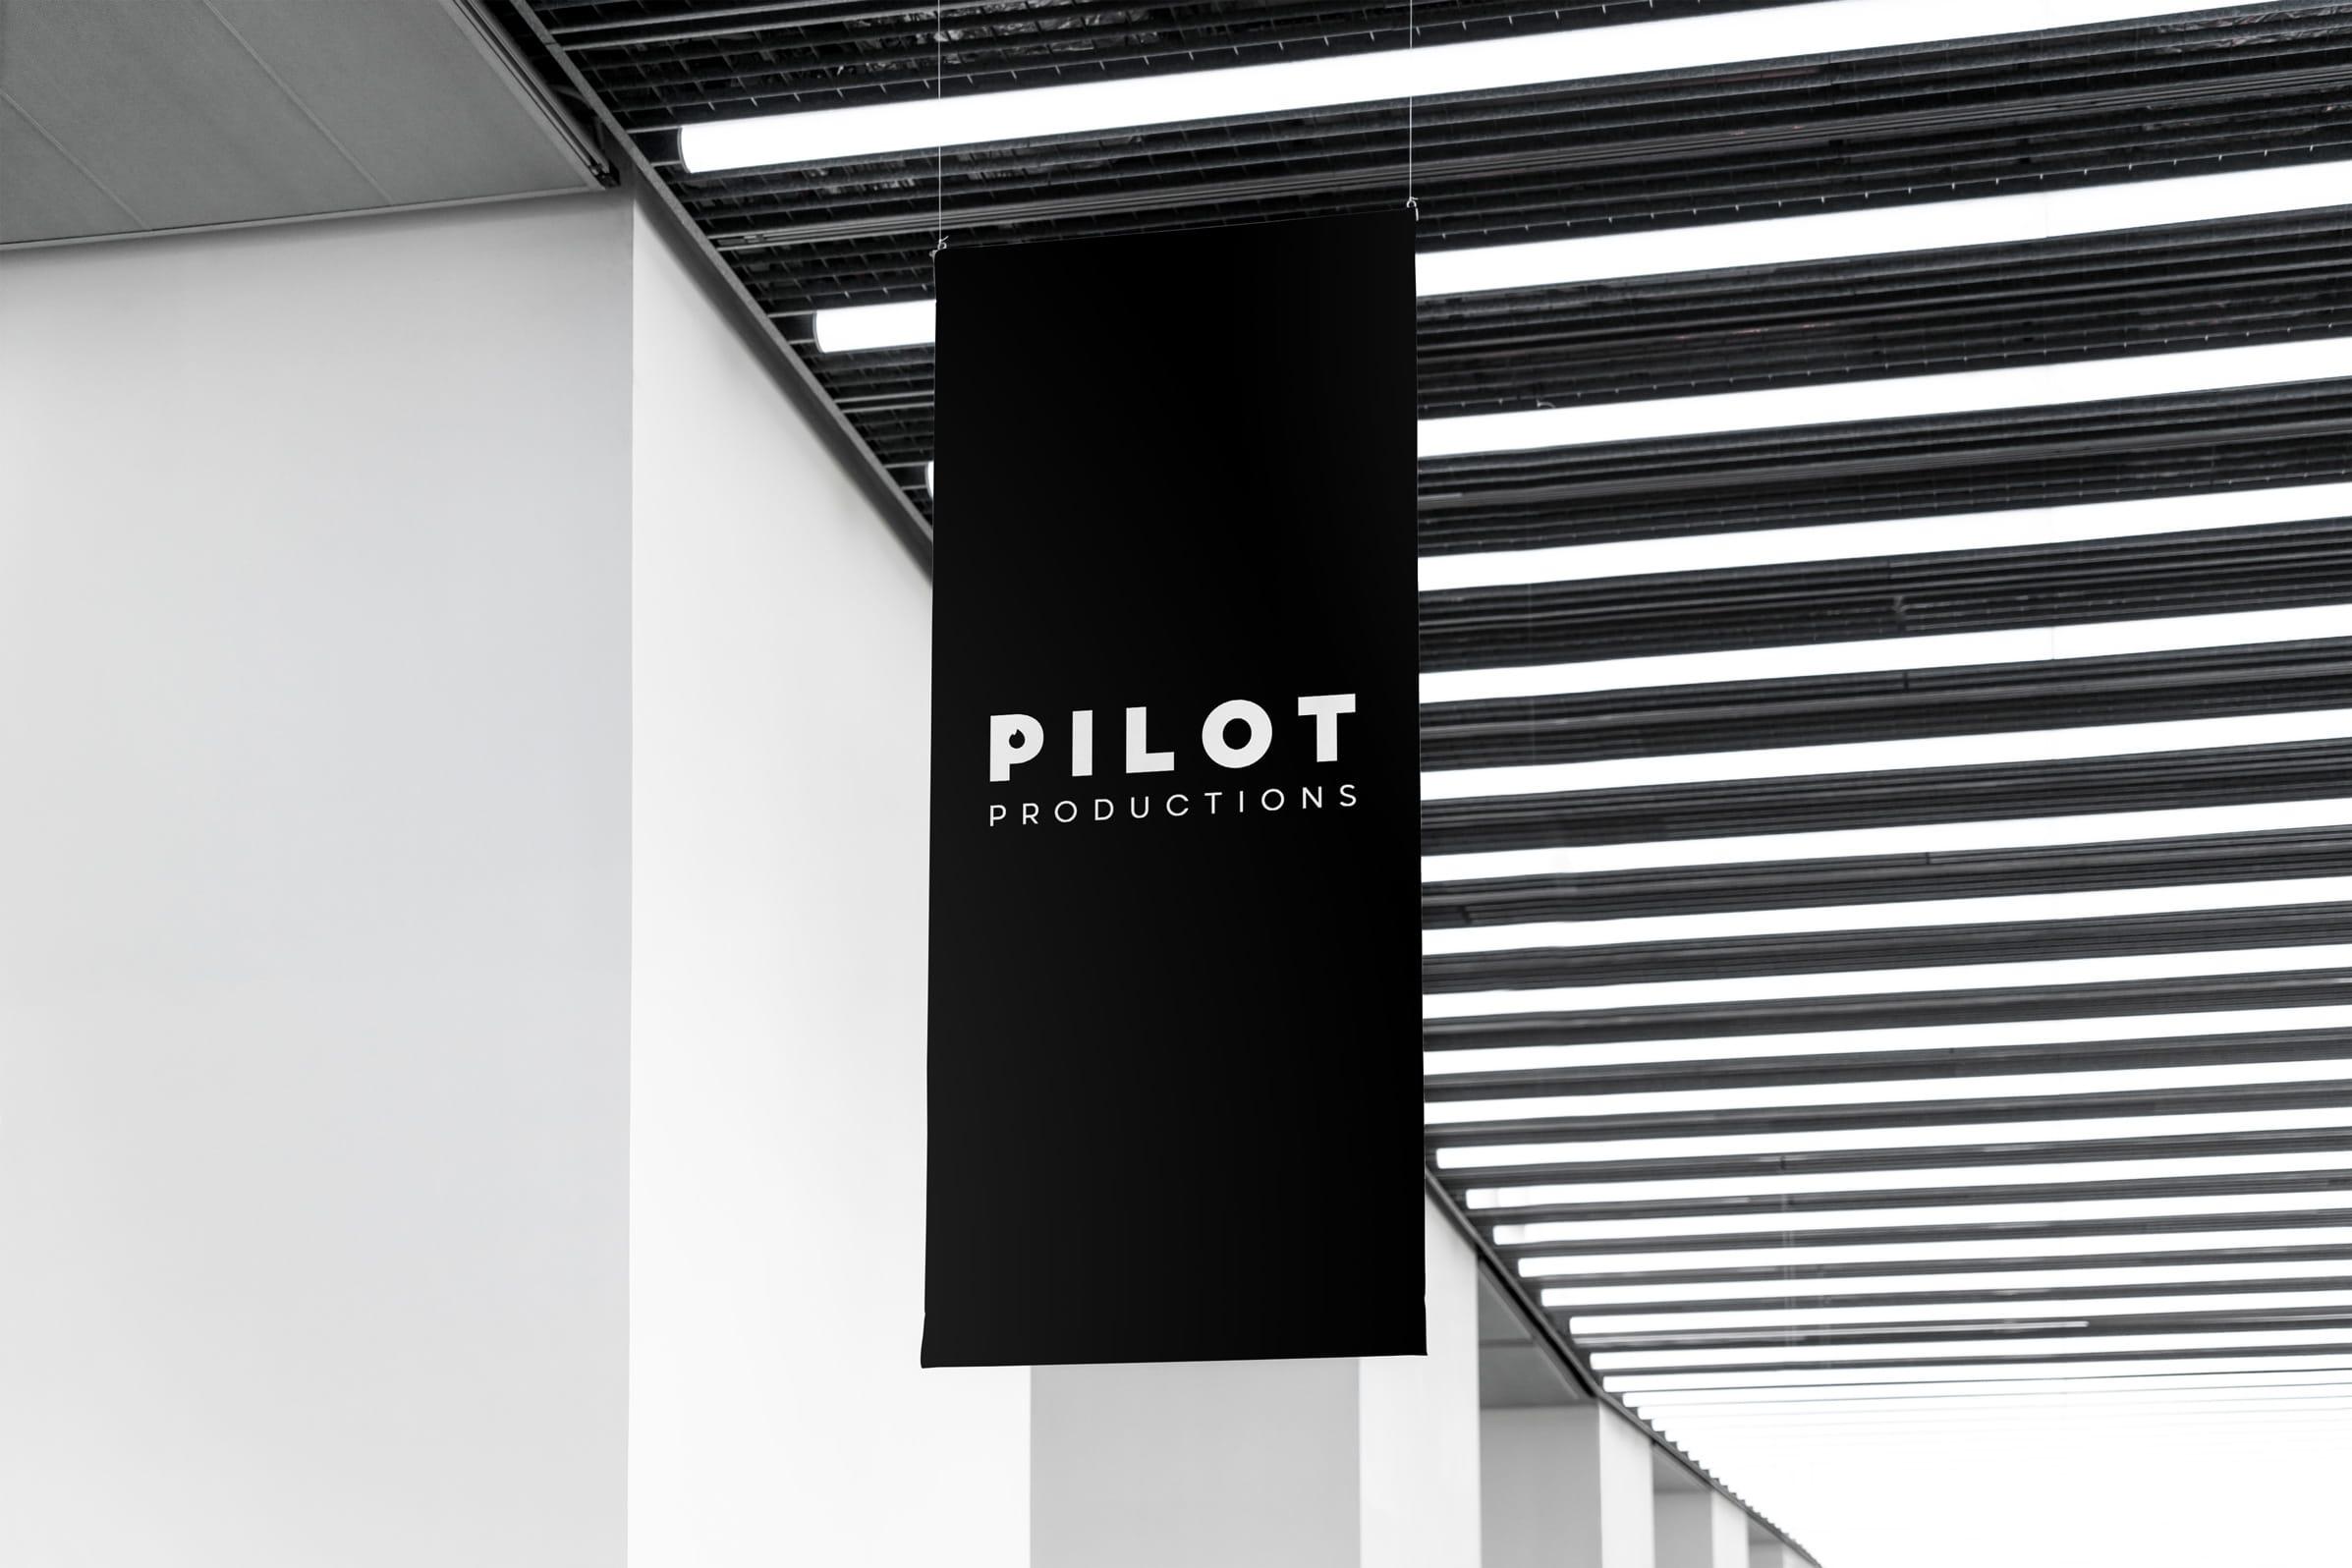 Pilot flag